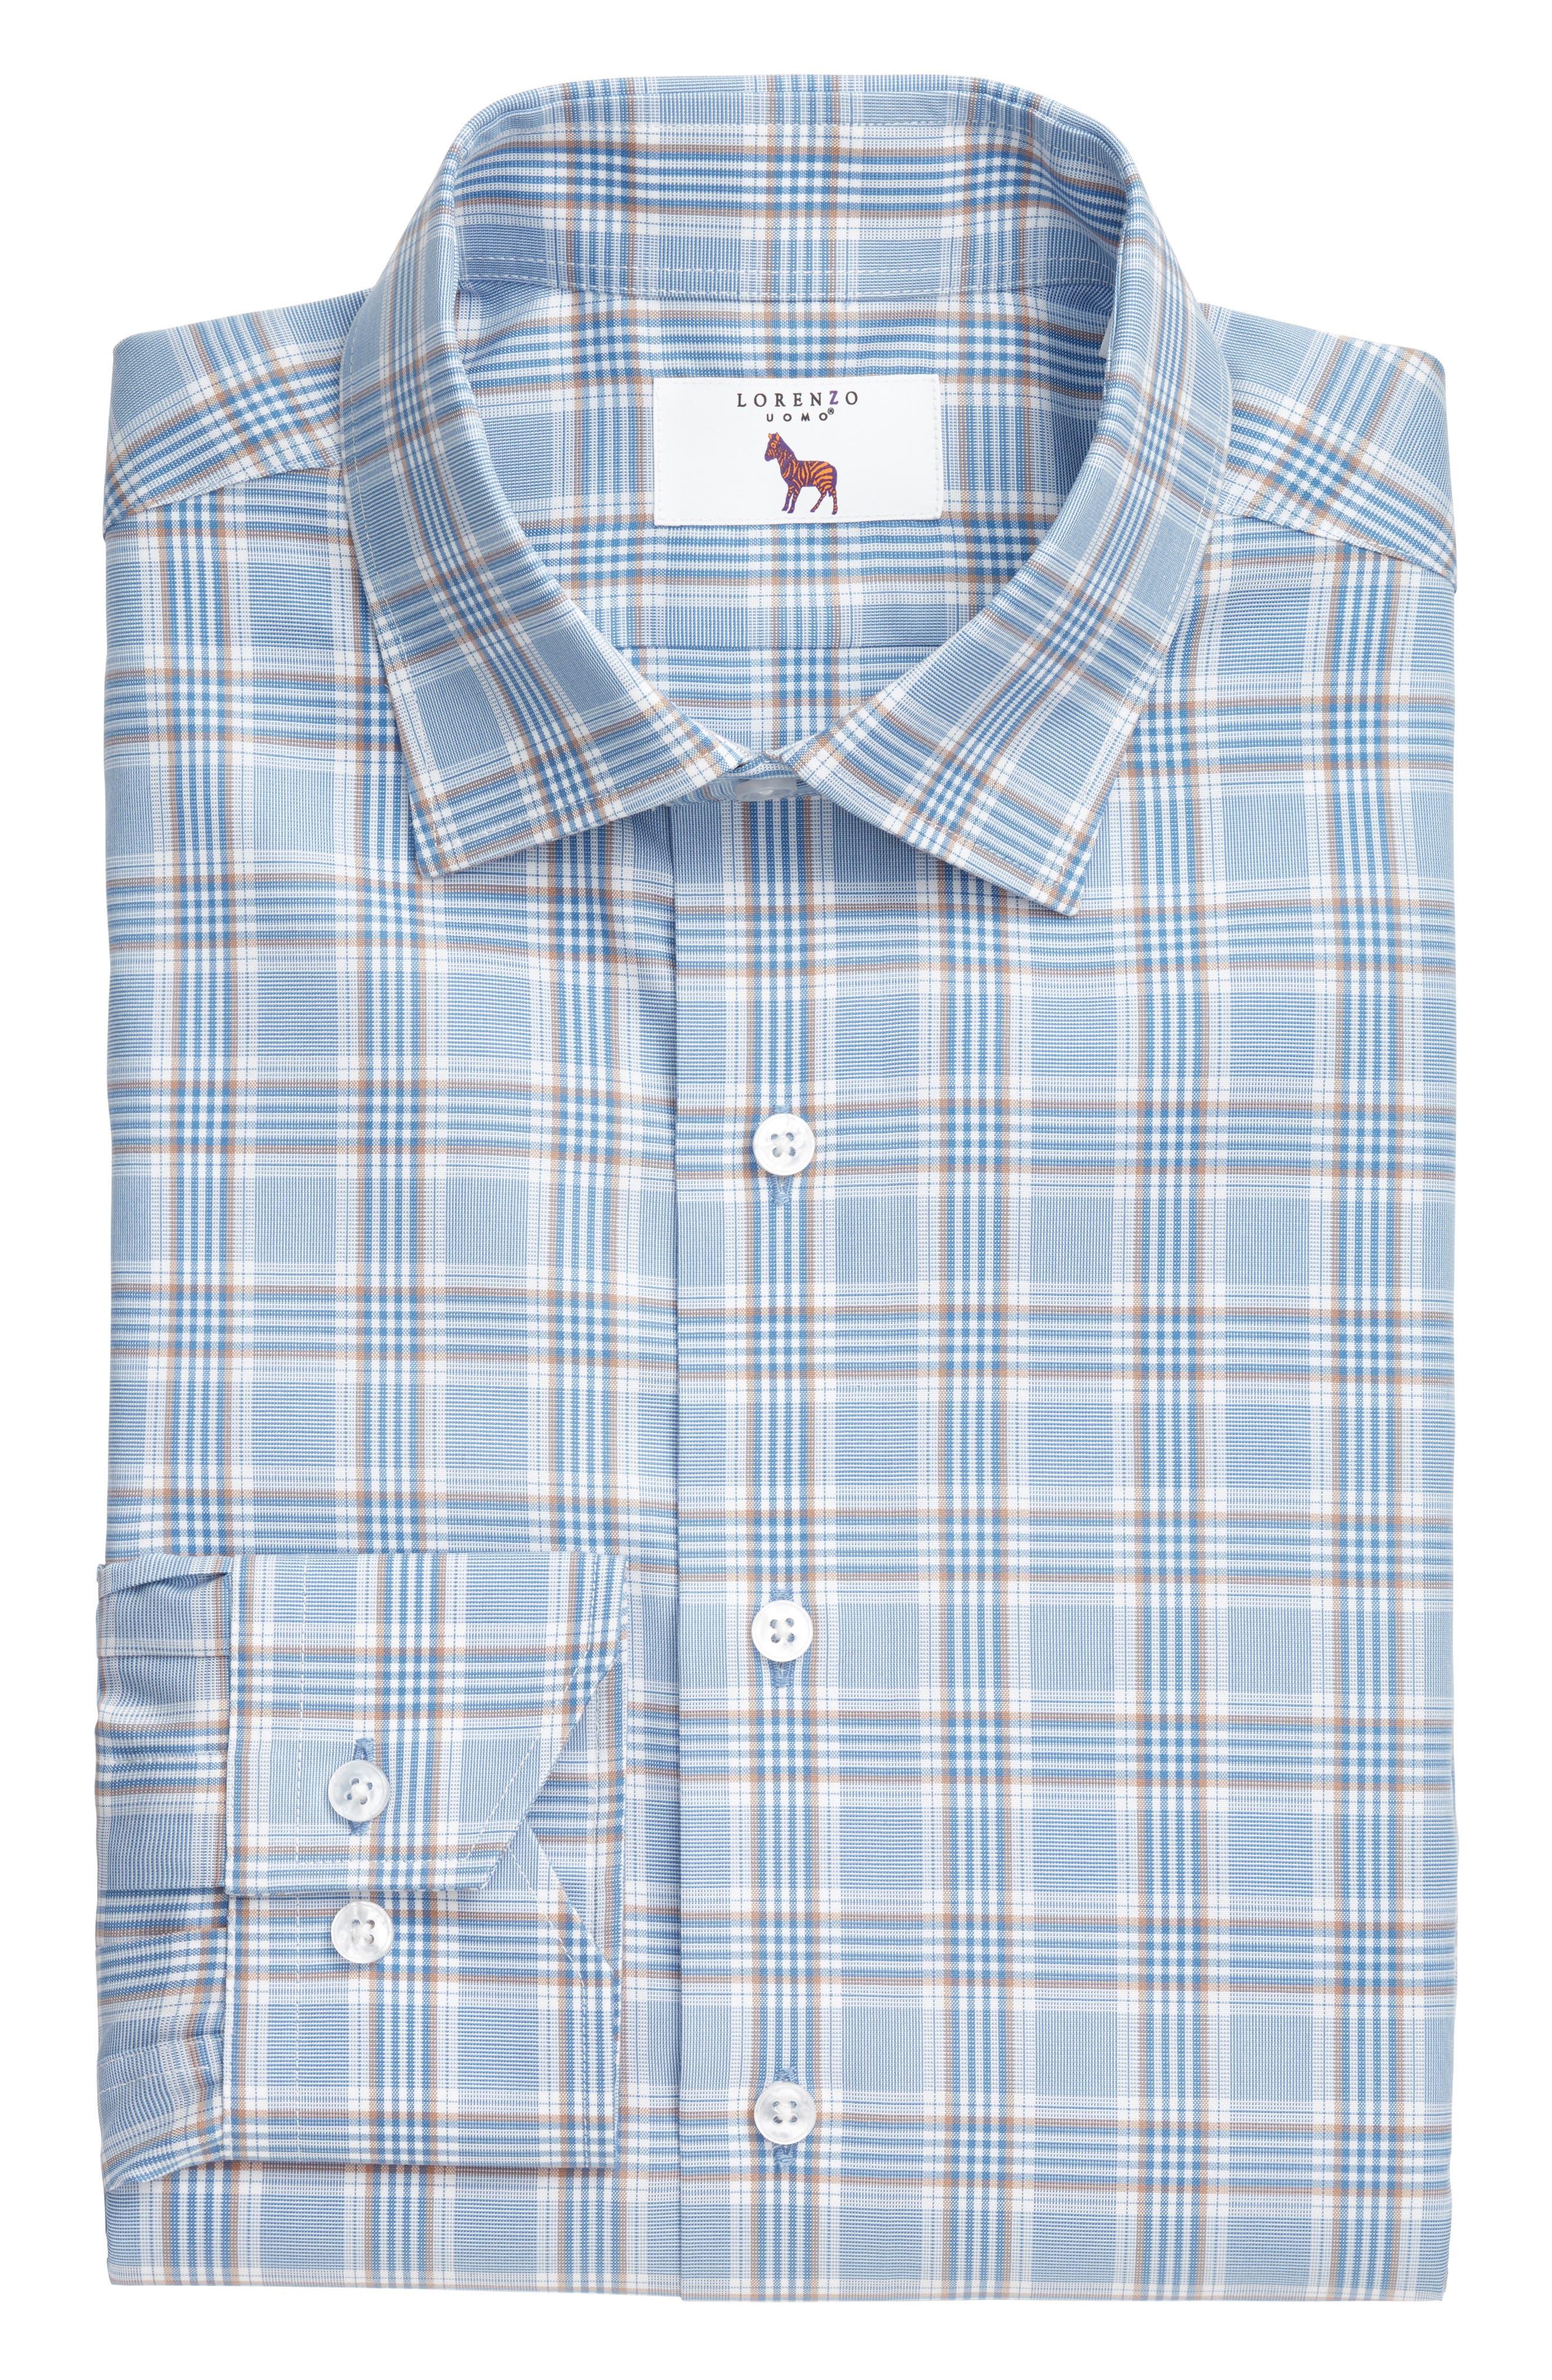 Trim Fit Plaid Dress Shirt,                             Alternate thumbnail 3, color,                             LIGHT BLUE